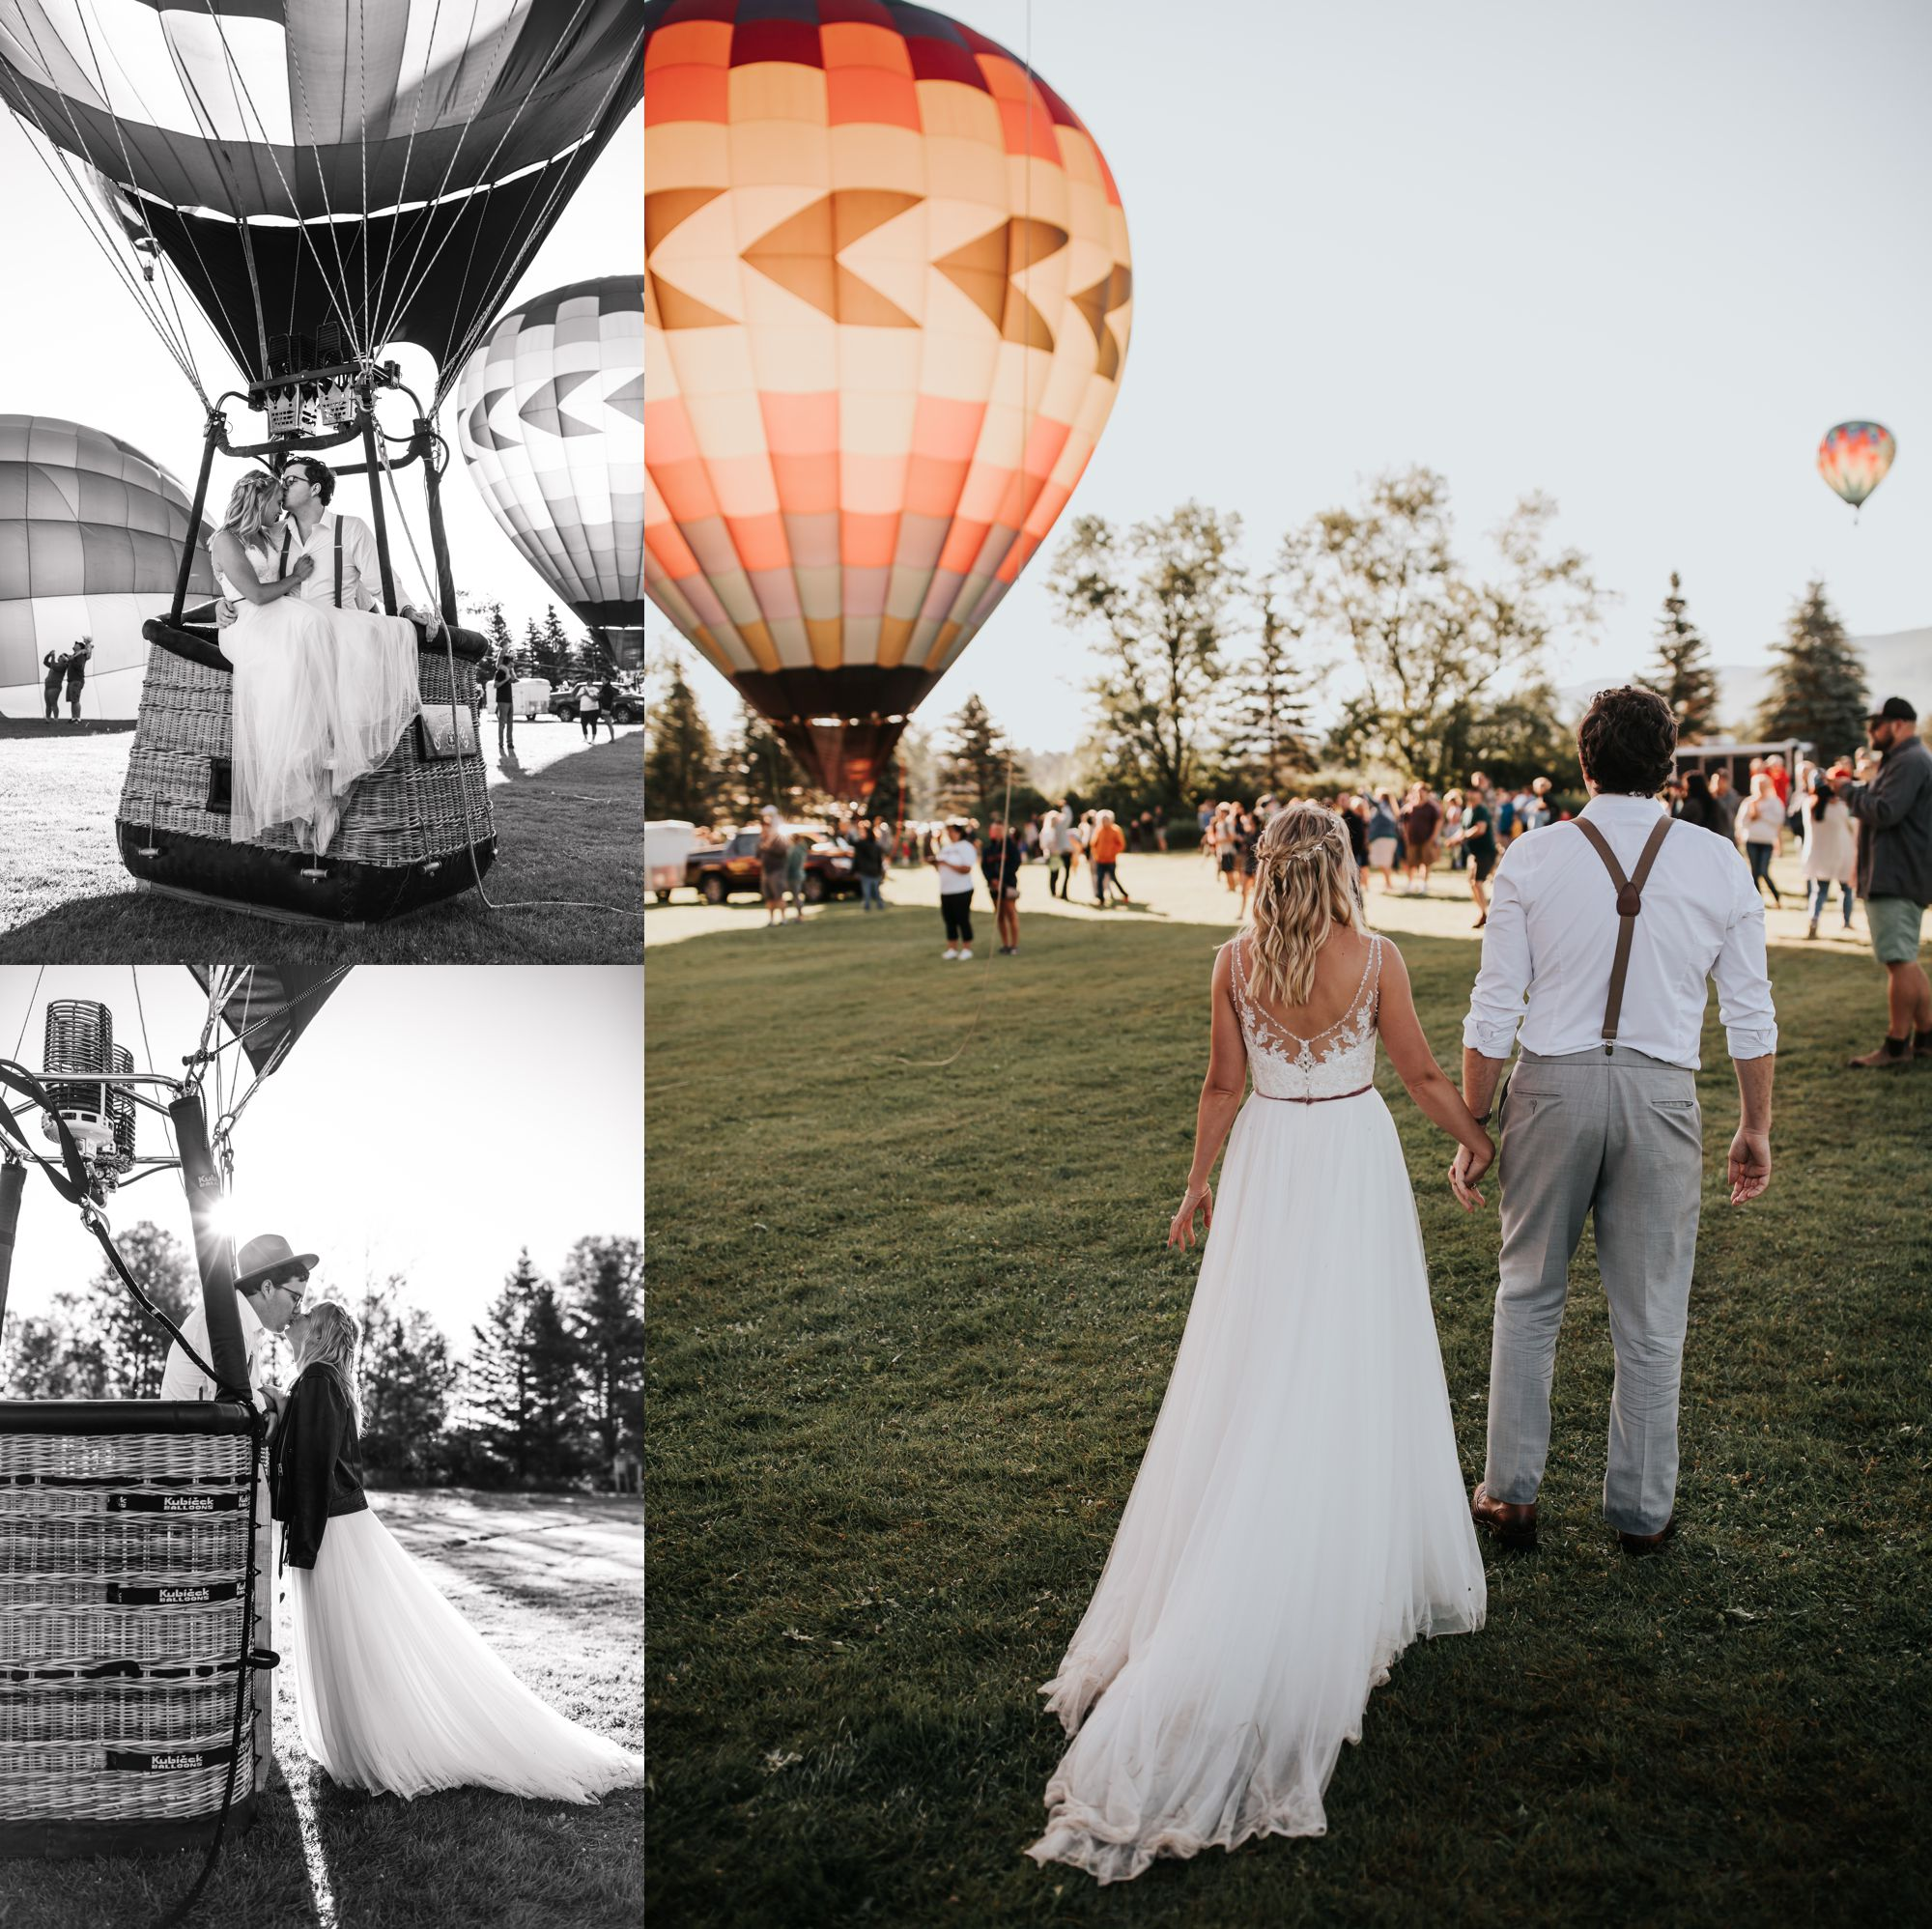 Stoweflake Balloon Bride and Groom